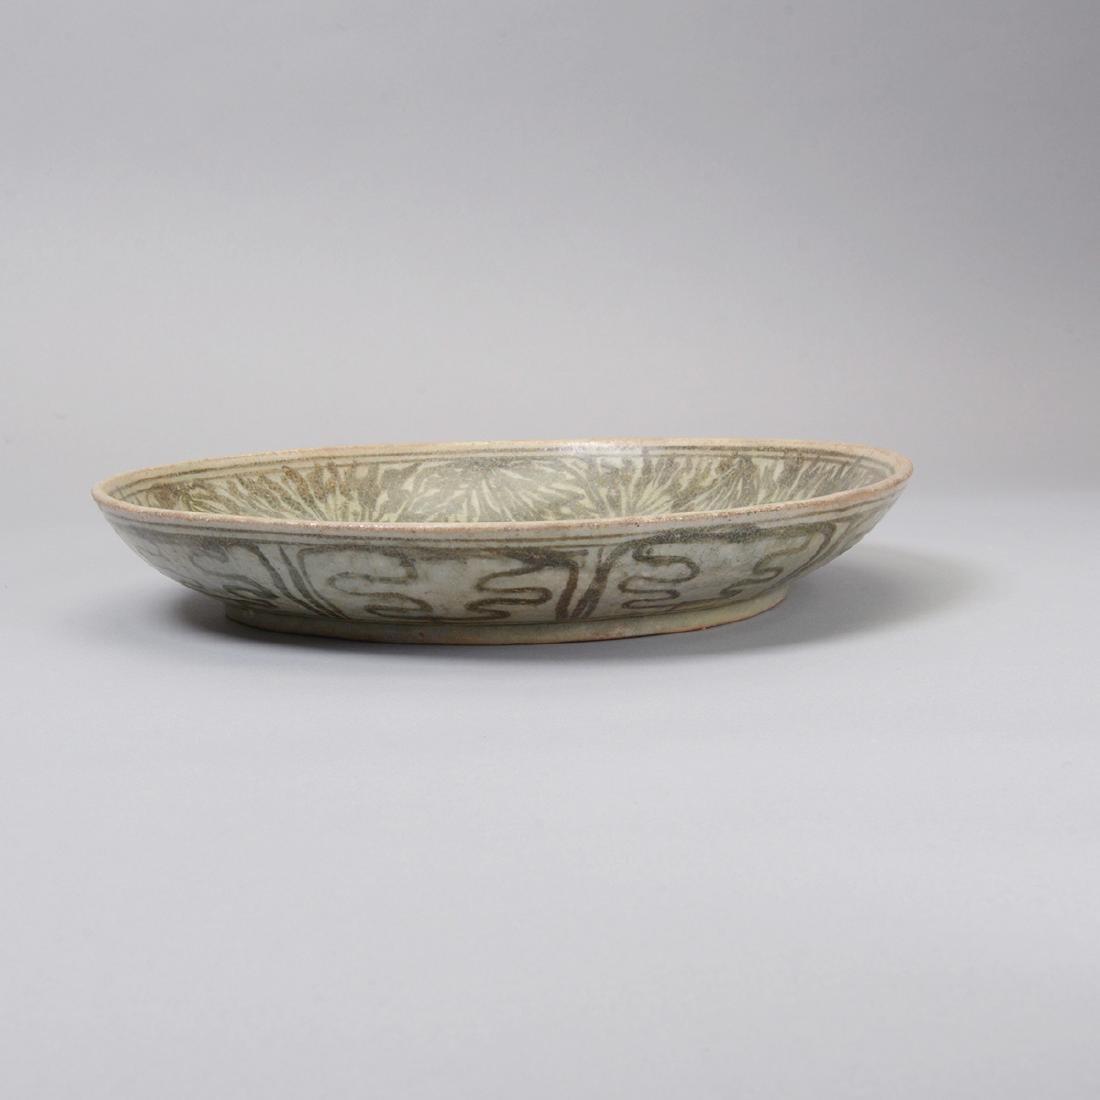 Large Group of Thai Glazed Ceramics, 7th - 16th C - 4